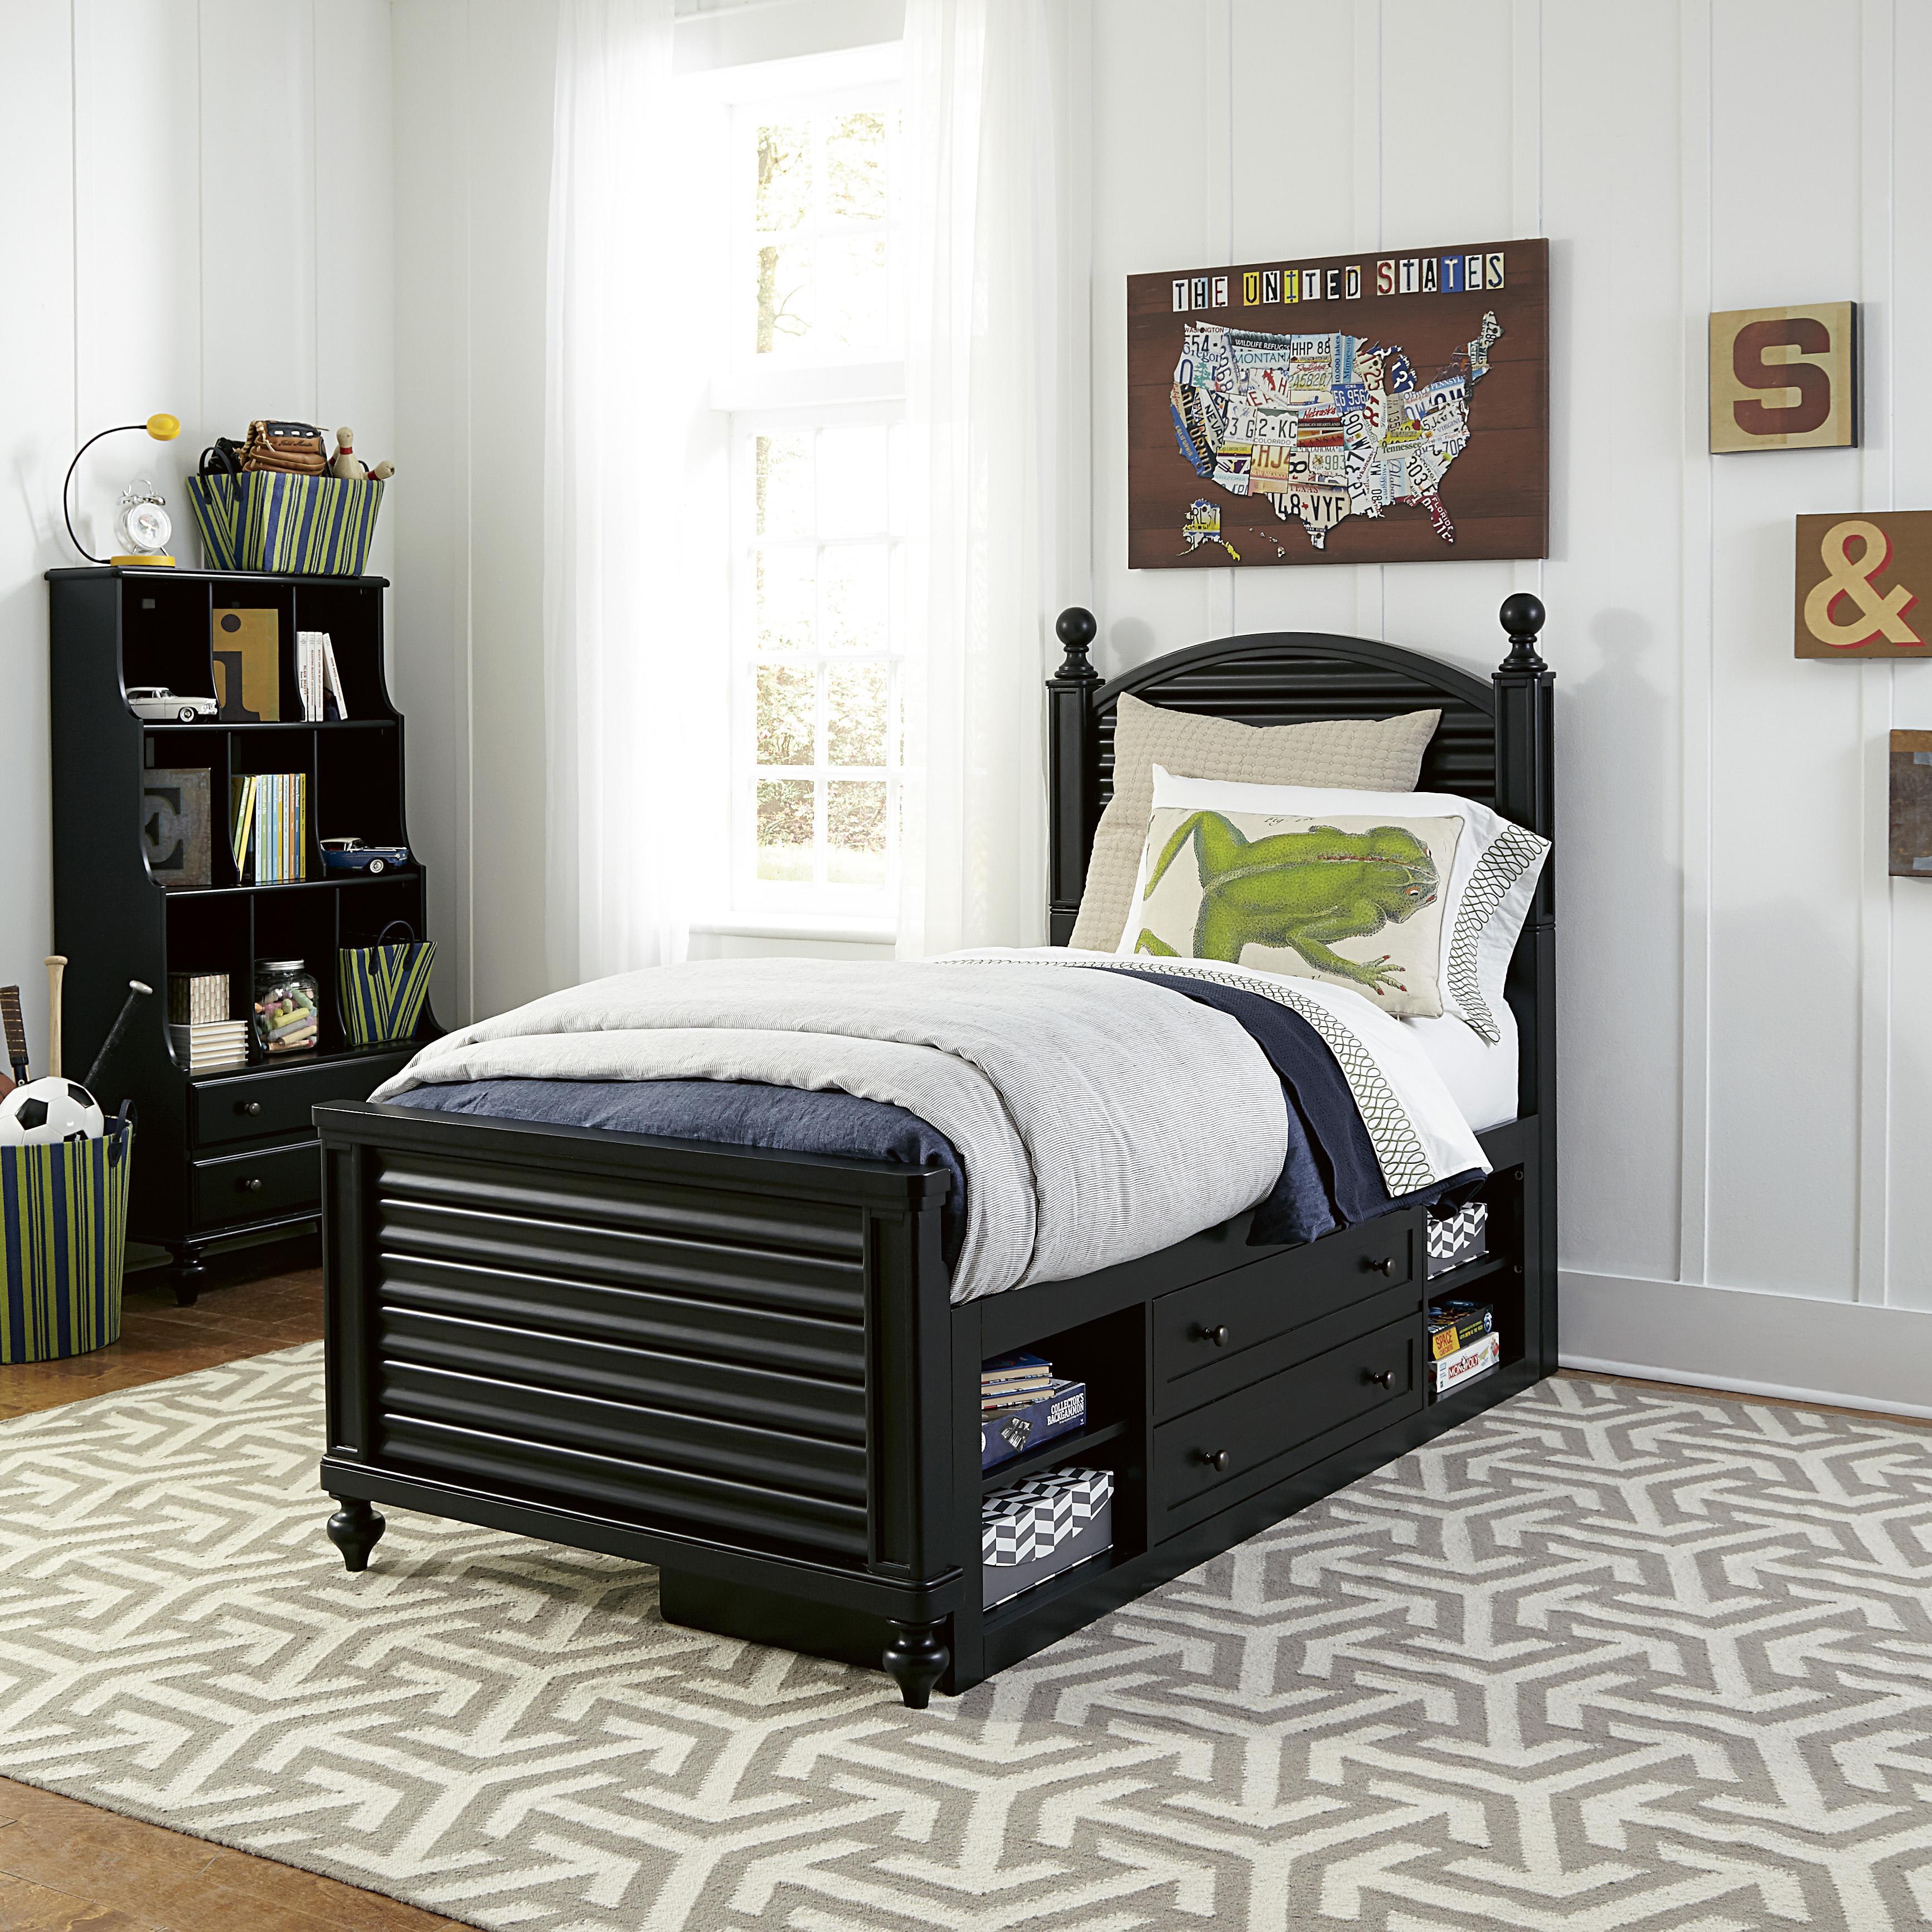 Smartstuff Black and White Full Bedroom Group - Item Number: 437B F Bedroom Group 4